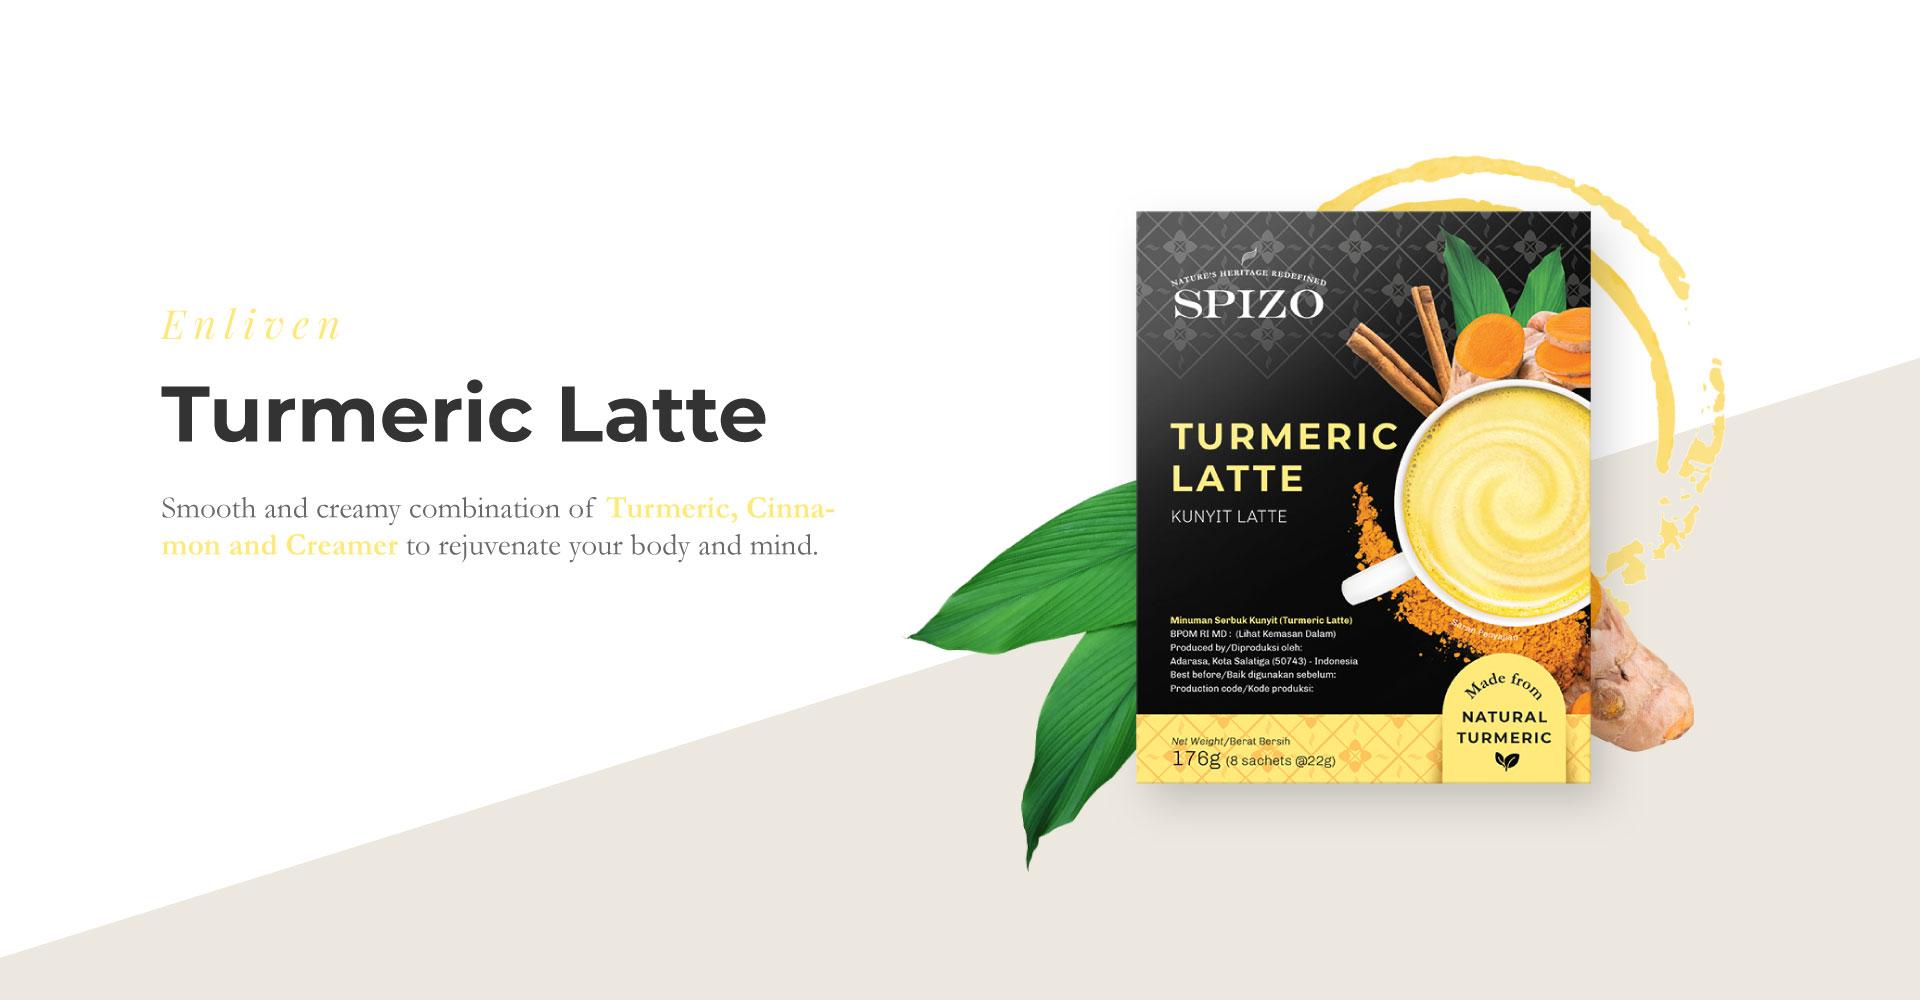 Turmeric Latte Golden Milk Spizo Premium Heritage Drink